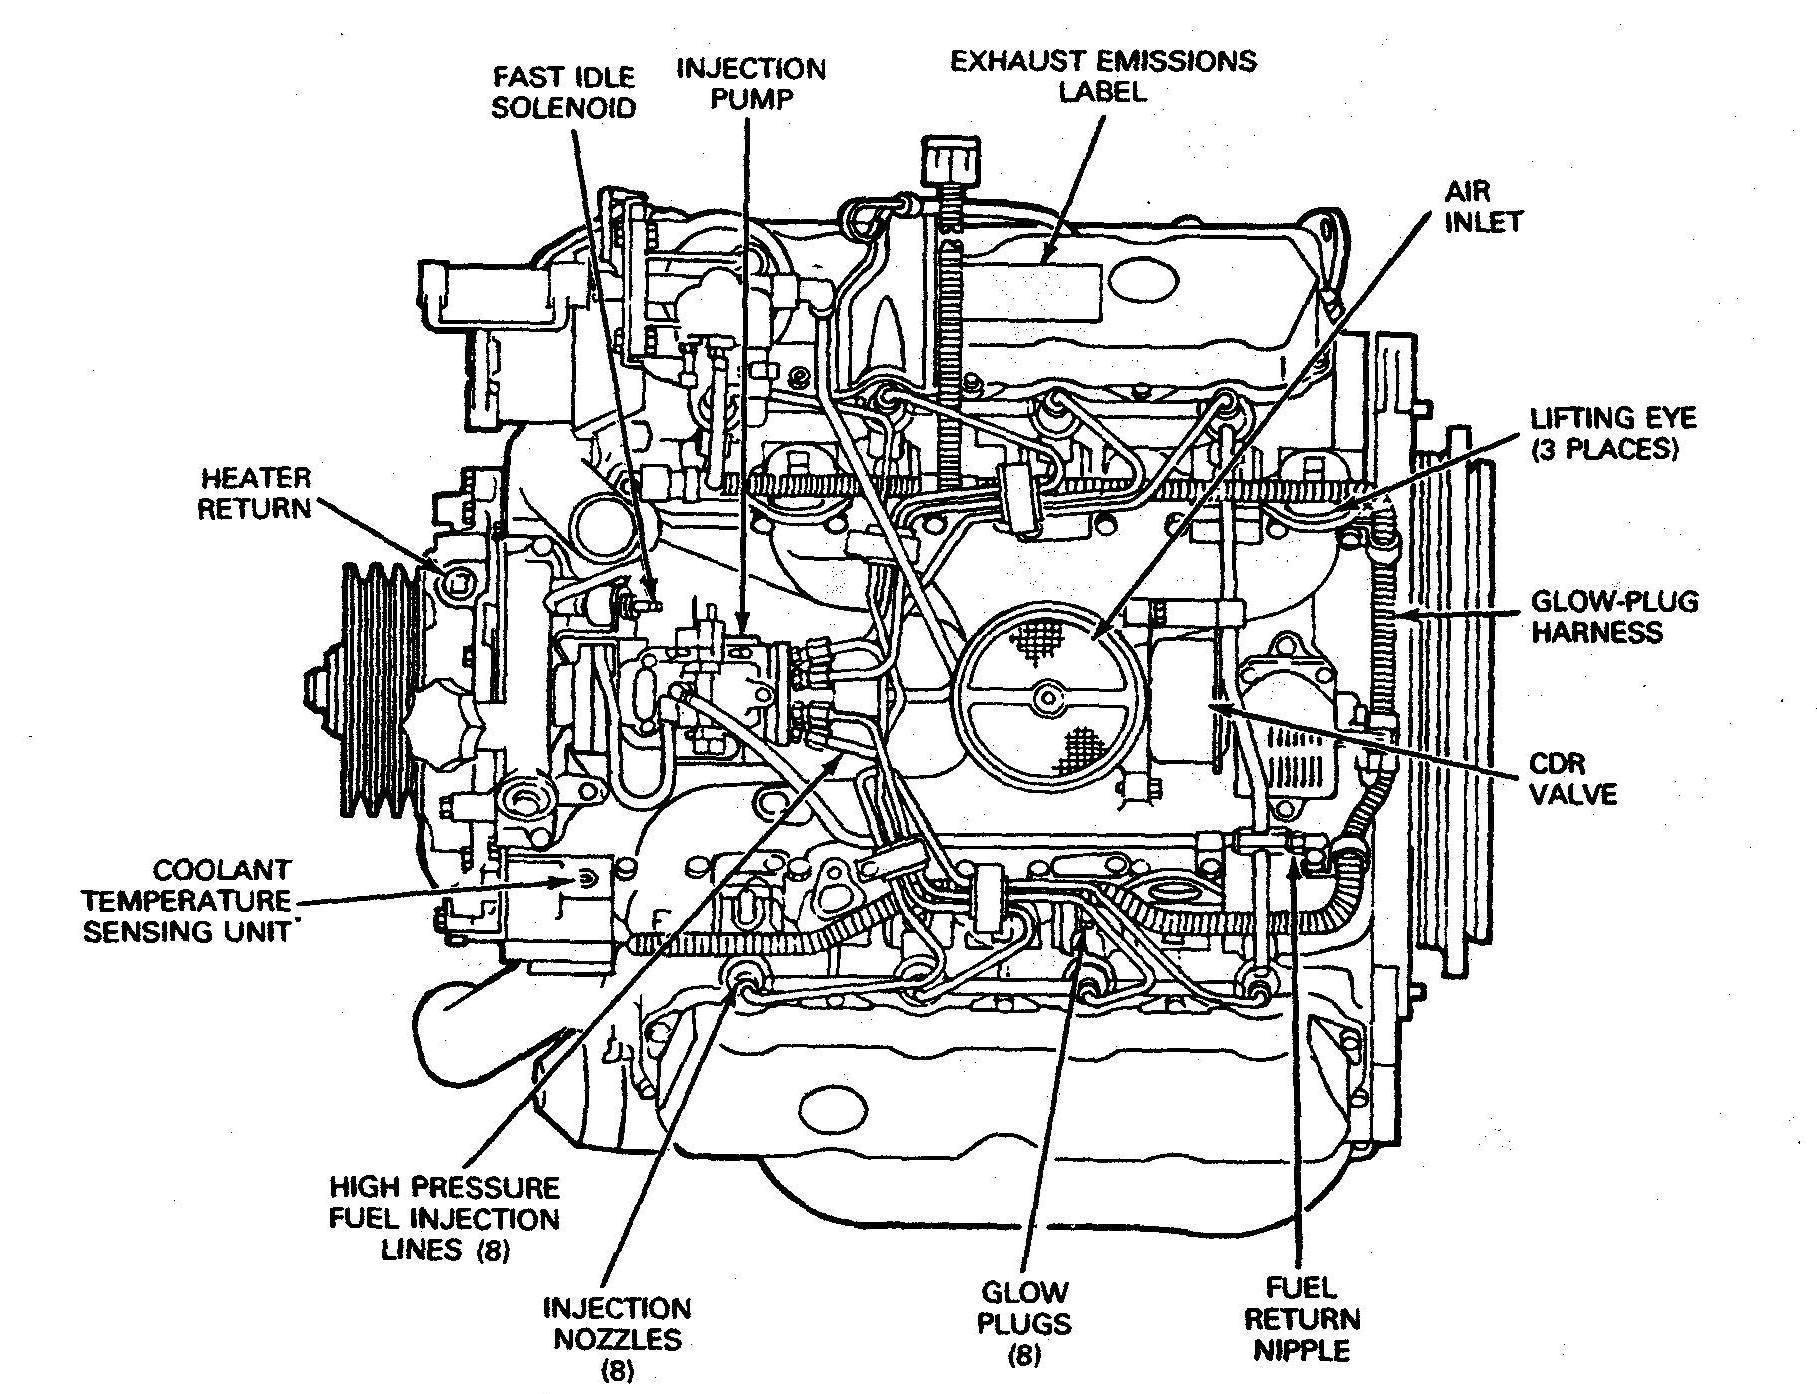 Auto Engine Diagrams Online Schematic Diagram Electronic 1996 Bmw 528i Basic Car Parts Pdf Viewmotorjdiorgrhviewmotorjdiorg At